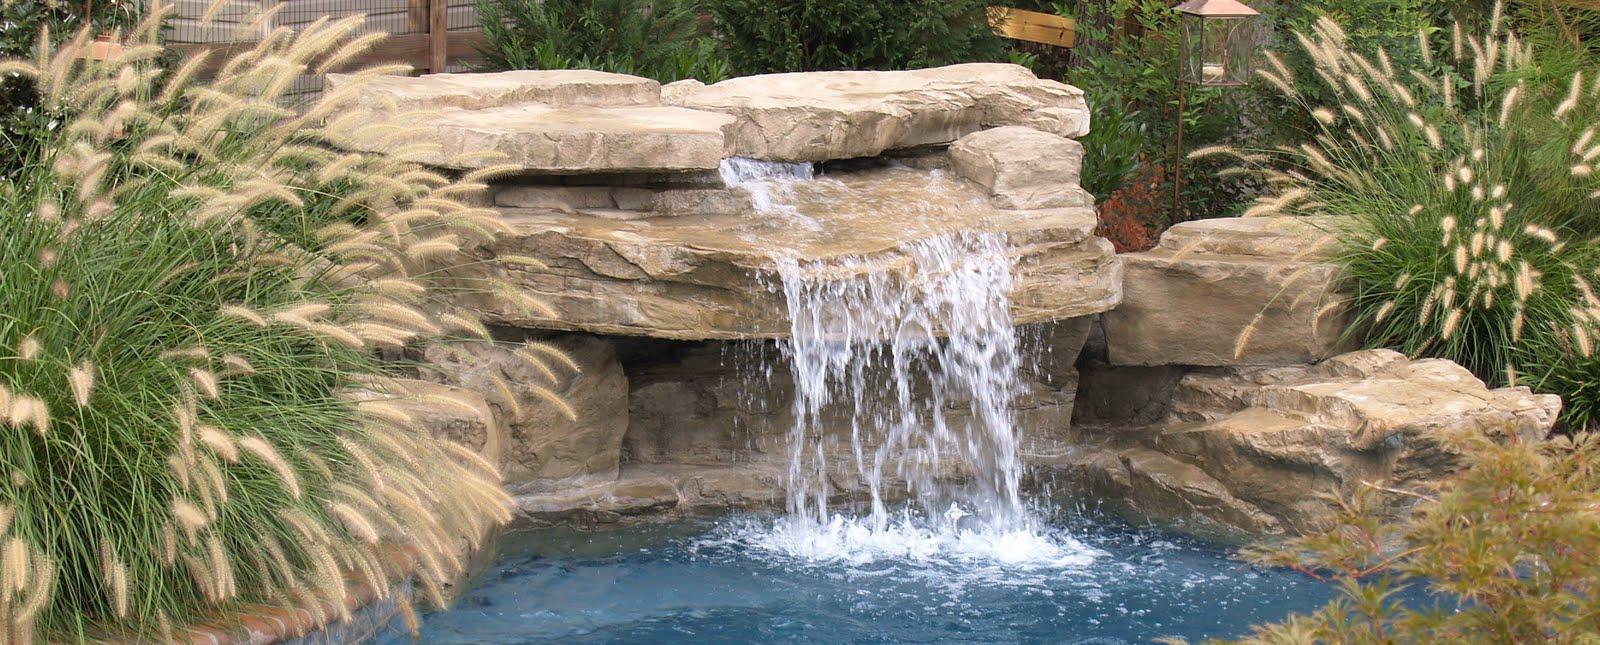 the american backyard make a splash